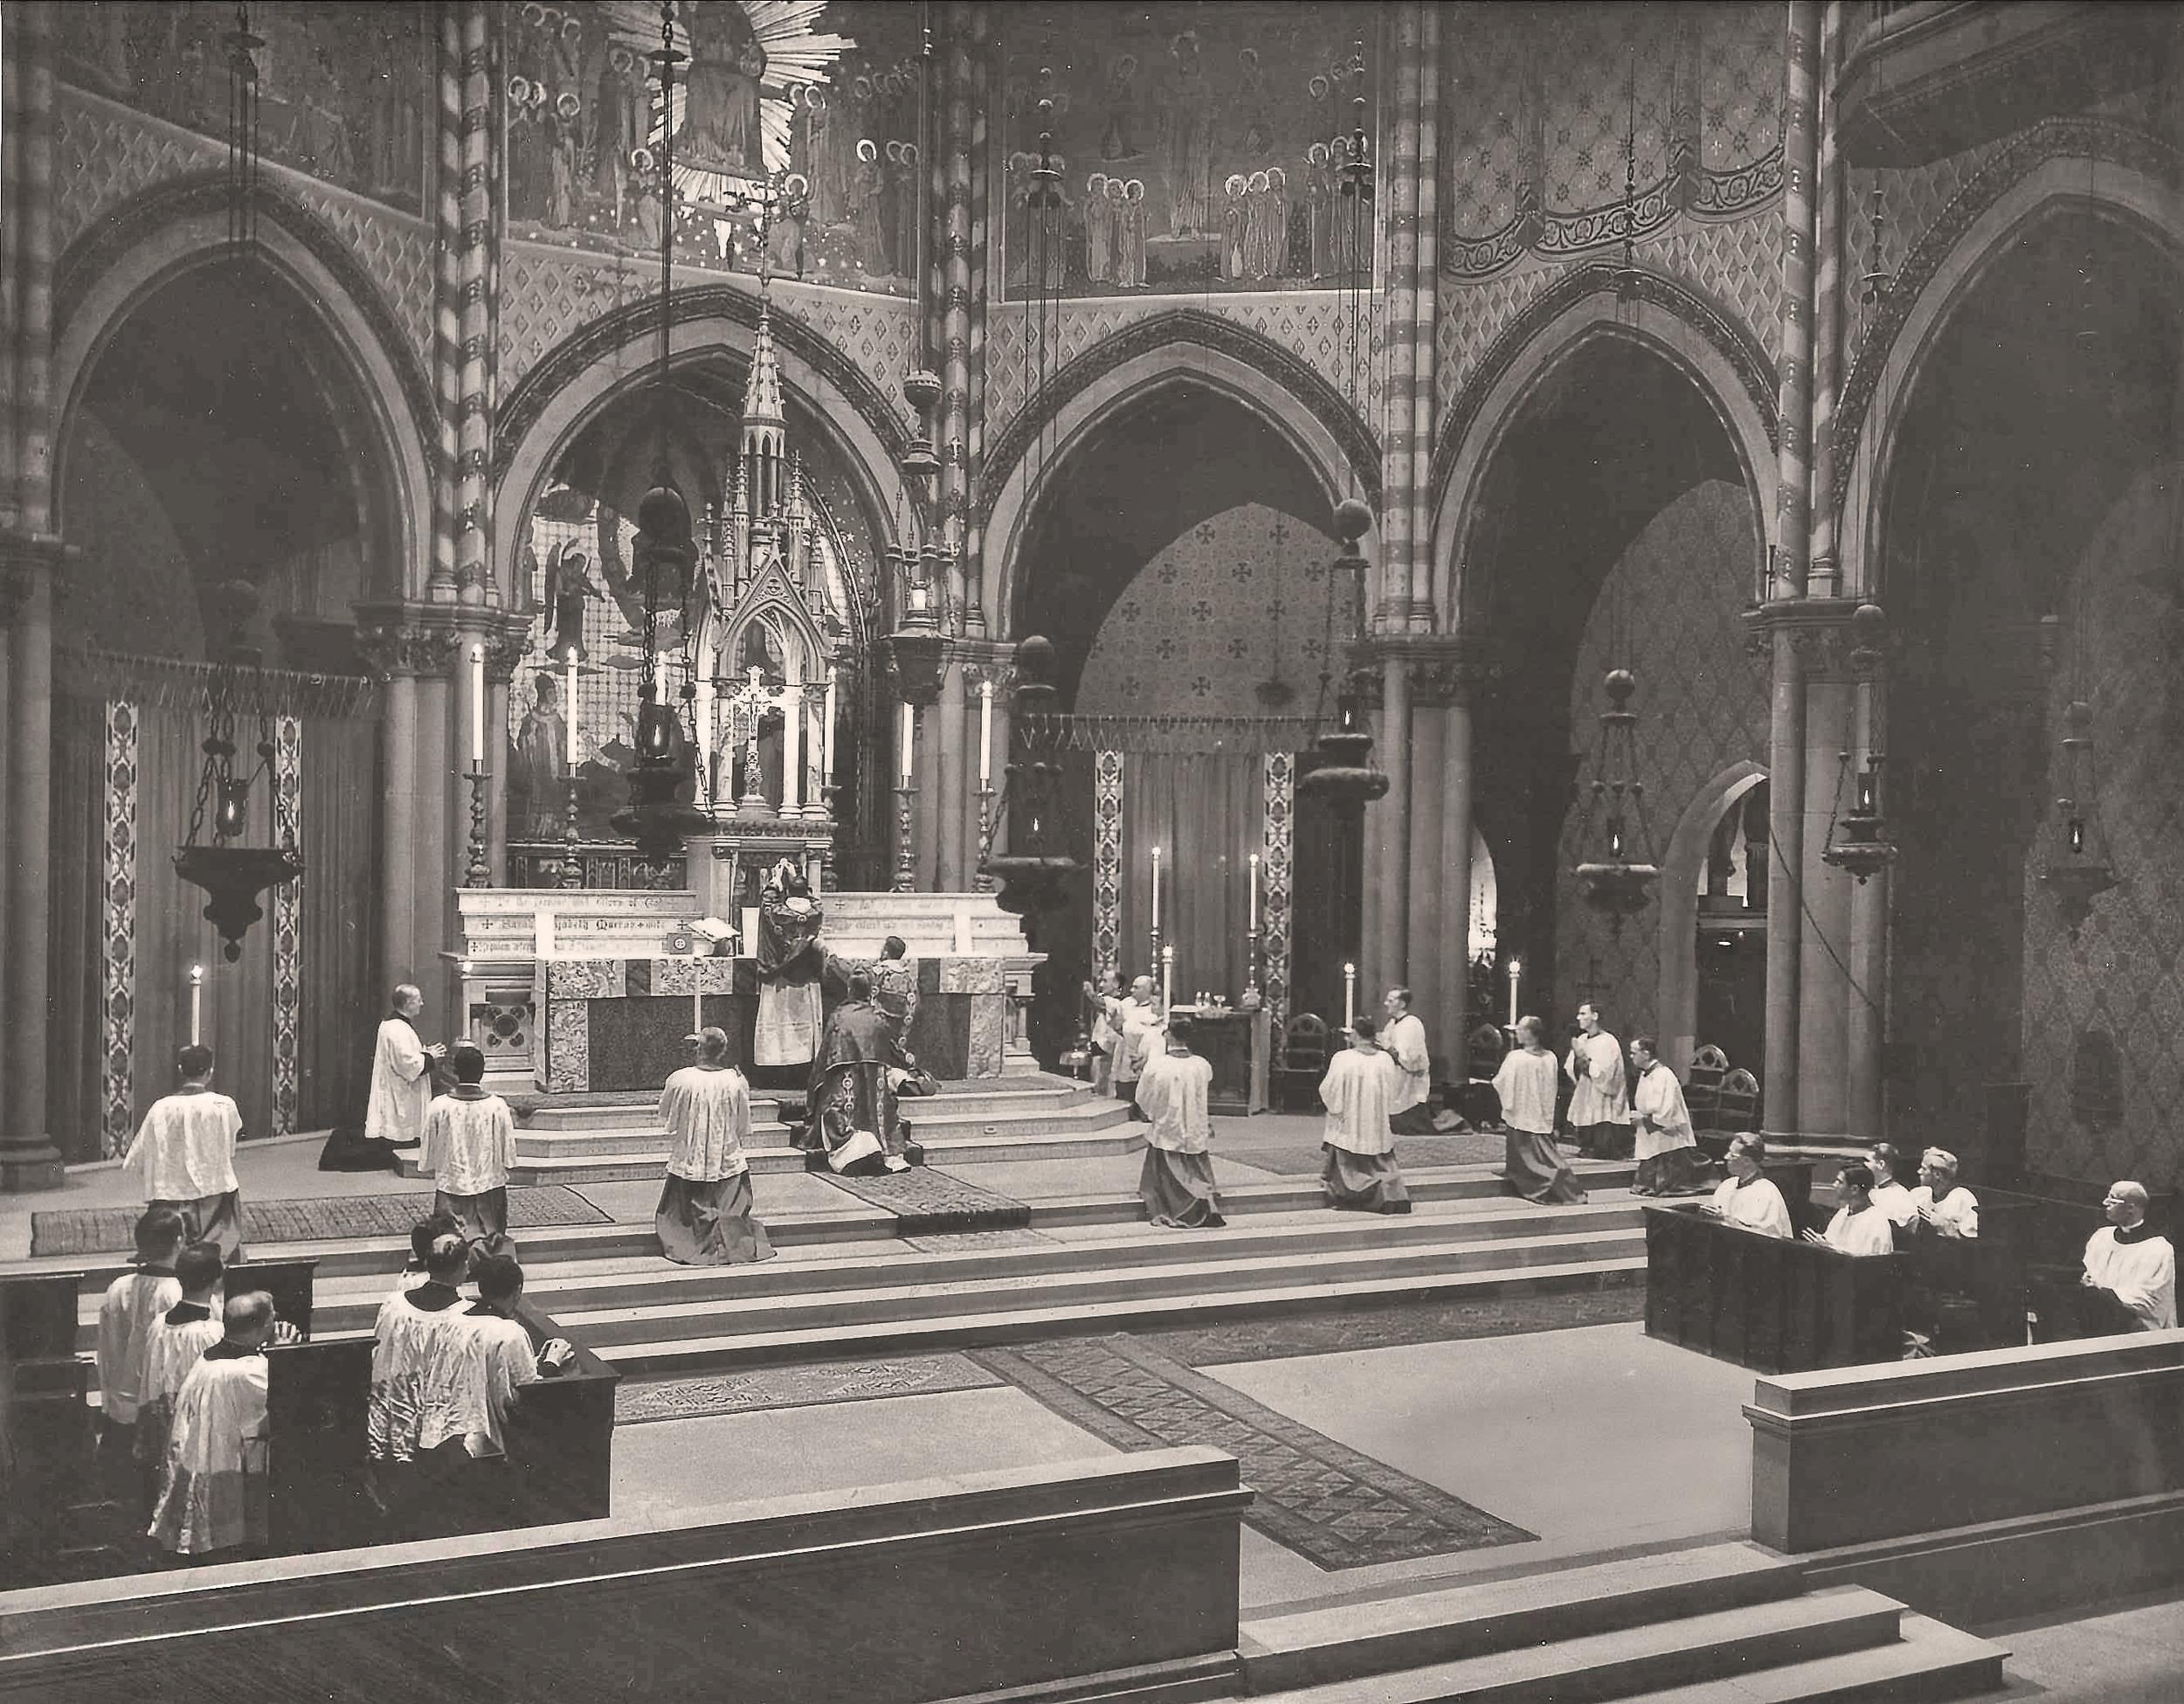 Armistice Day Solemn Mass in 1944